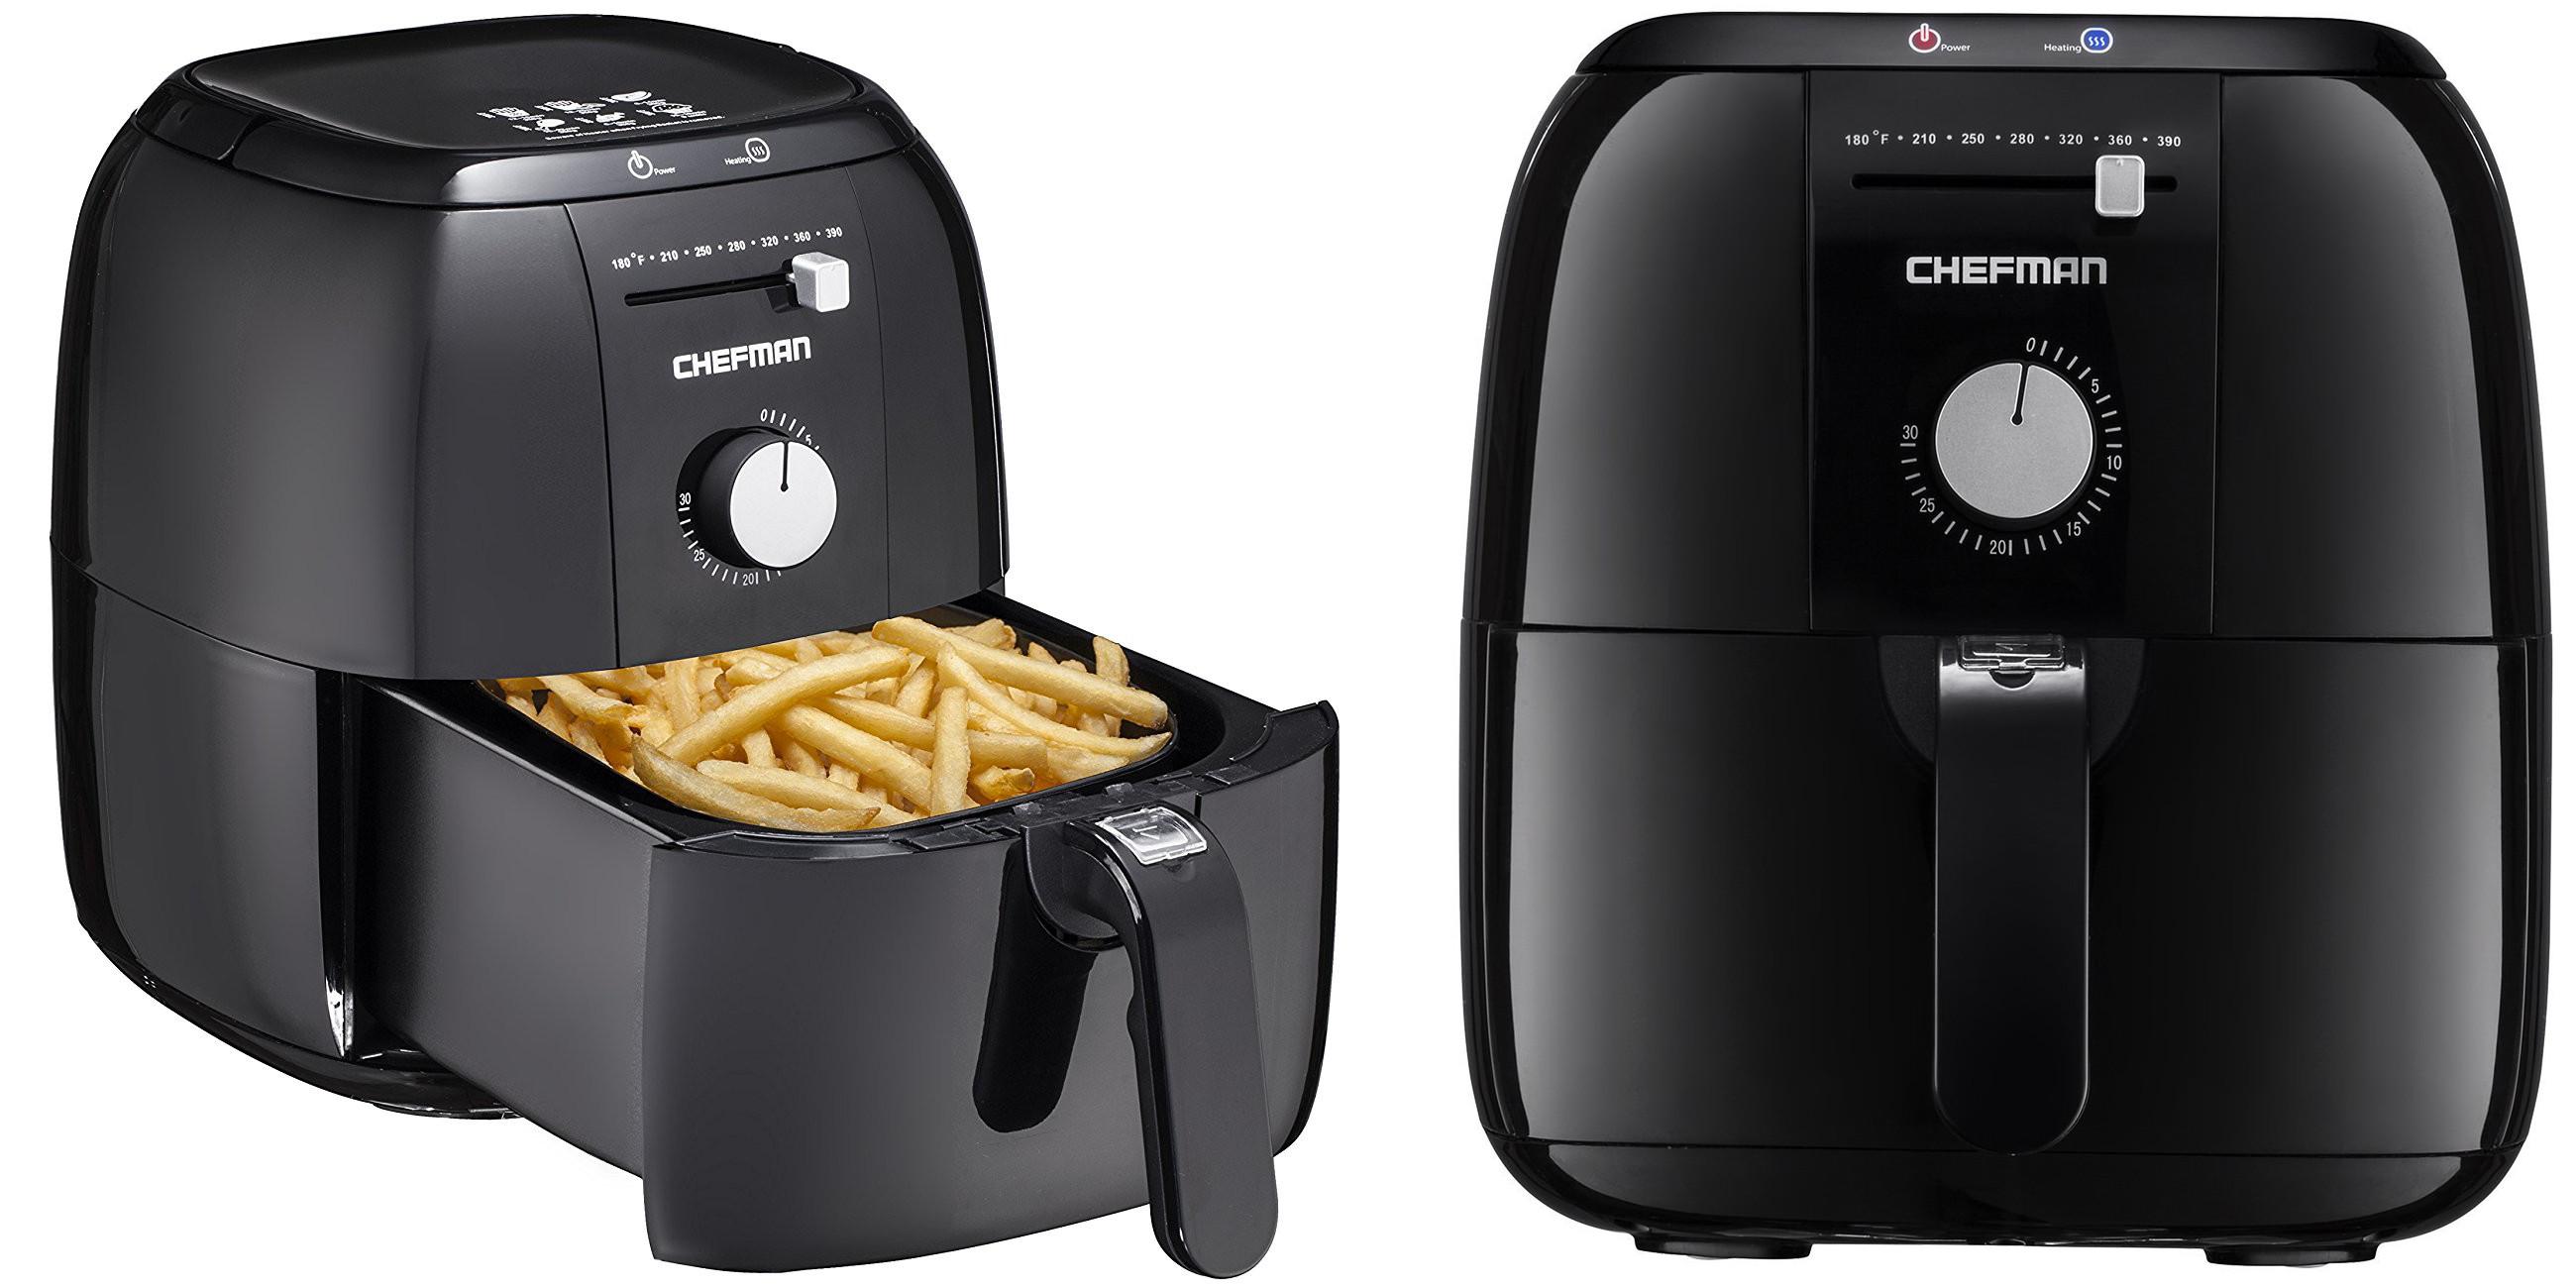 chefman-rj38-express-air-fryer-with-rapid-hot-air-technology-4